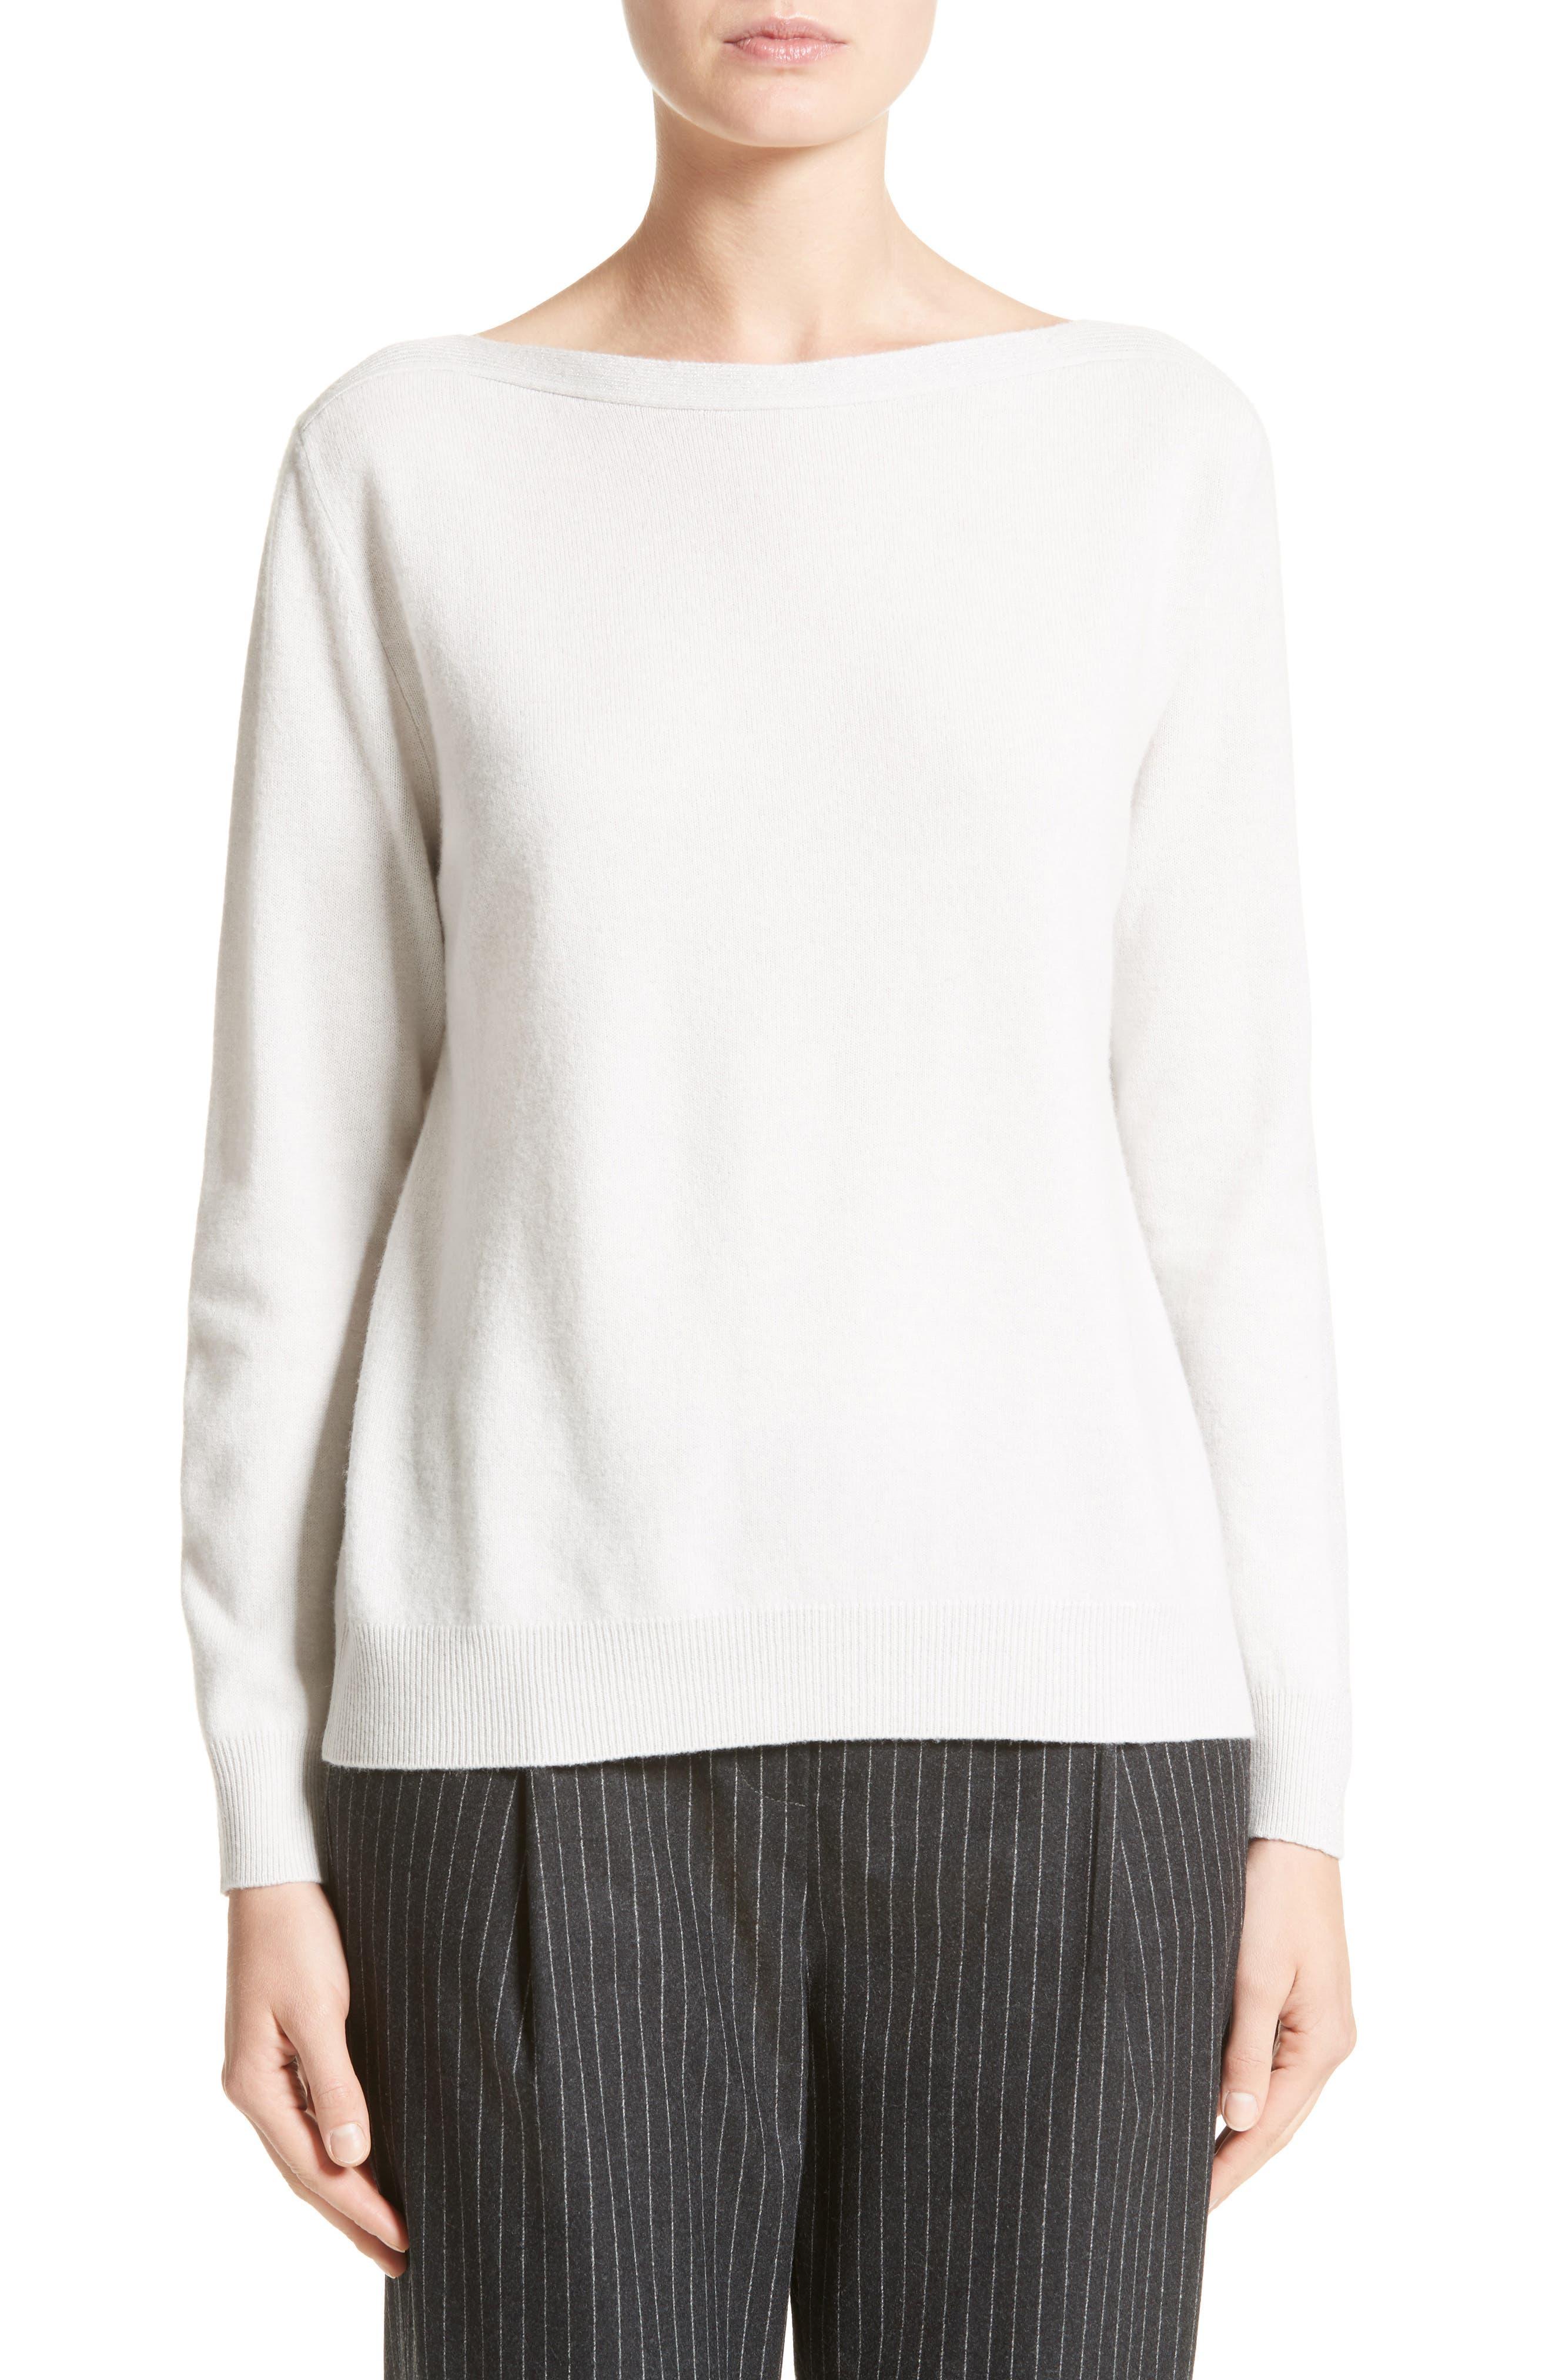 Alternate Image 1 Selected - Fabiana Filippi Wool, Silk & Cashmere Sweater